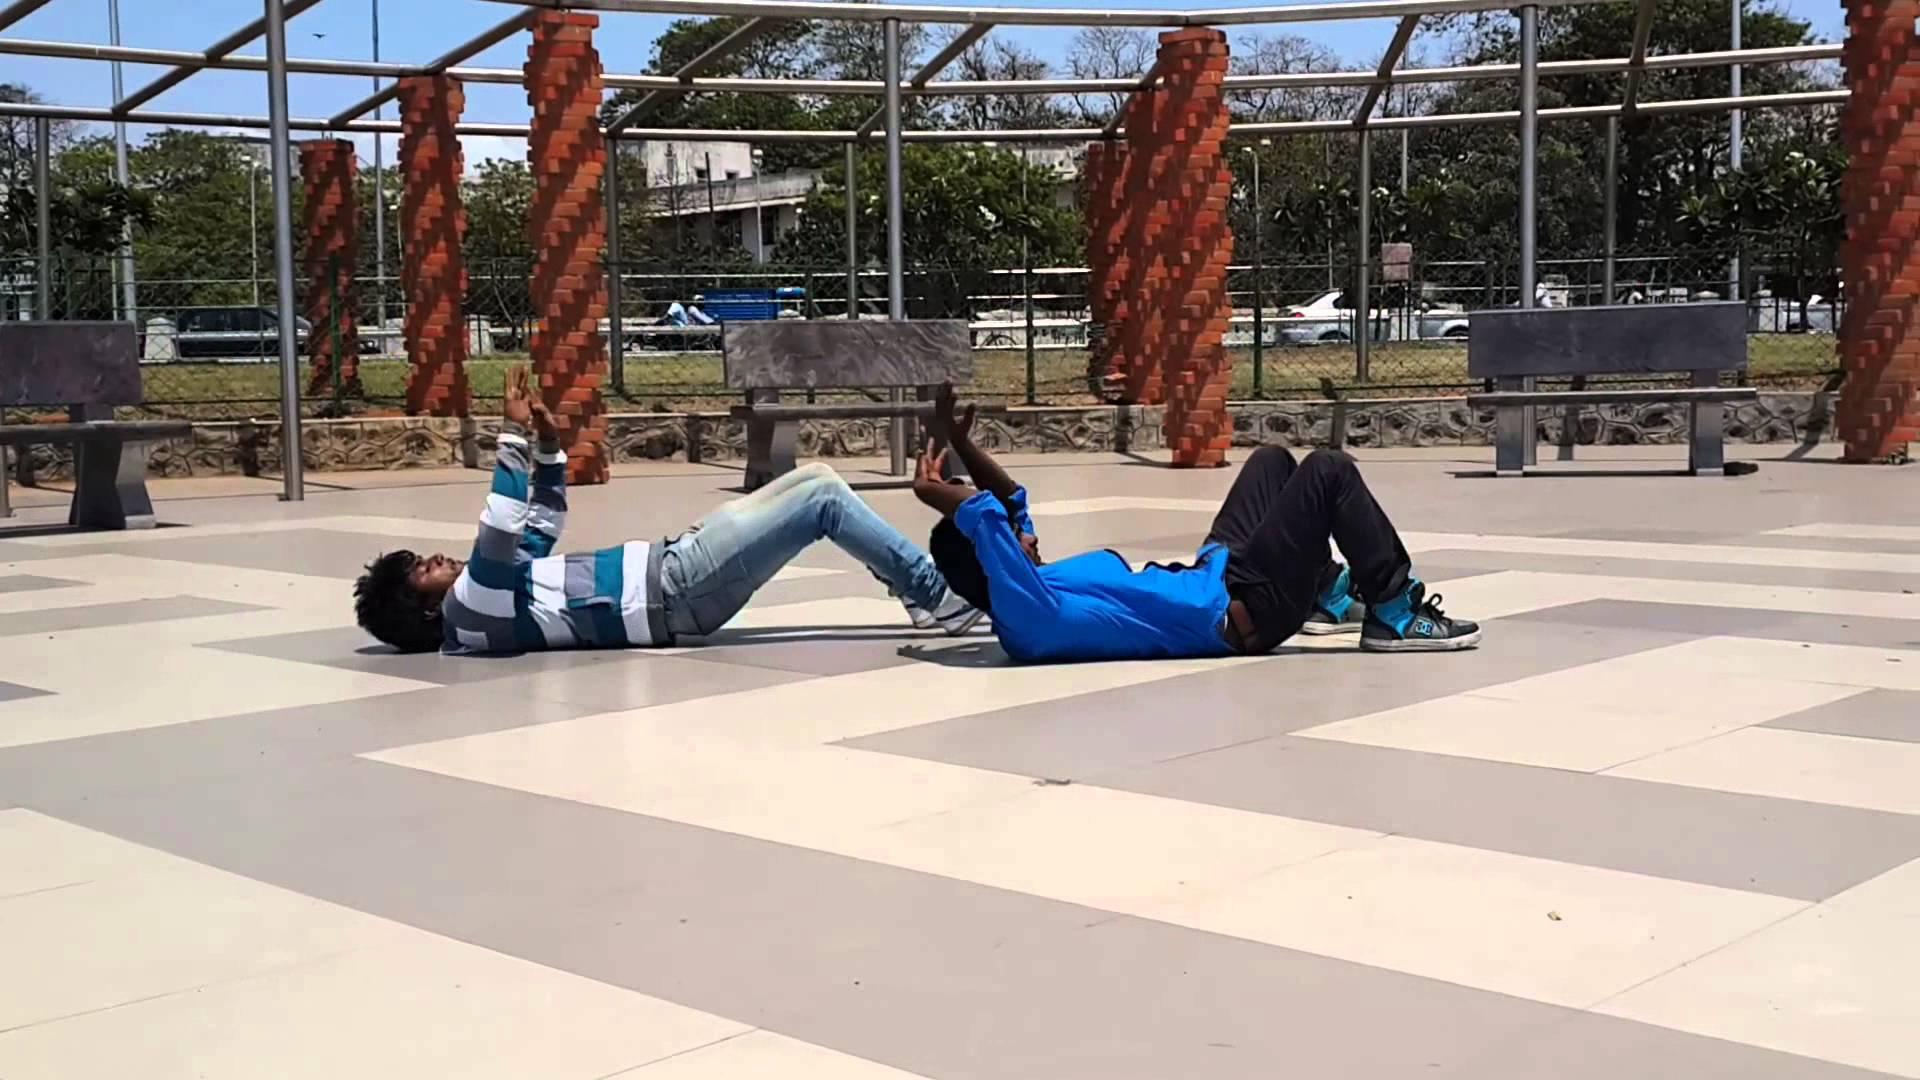 Udhungada sangu video song VIP by SNAZZY BOYZ